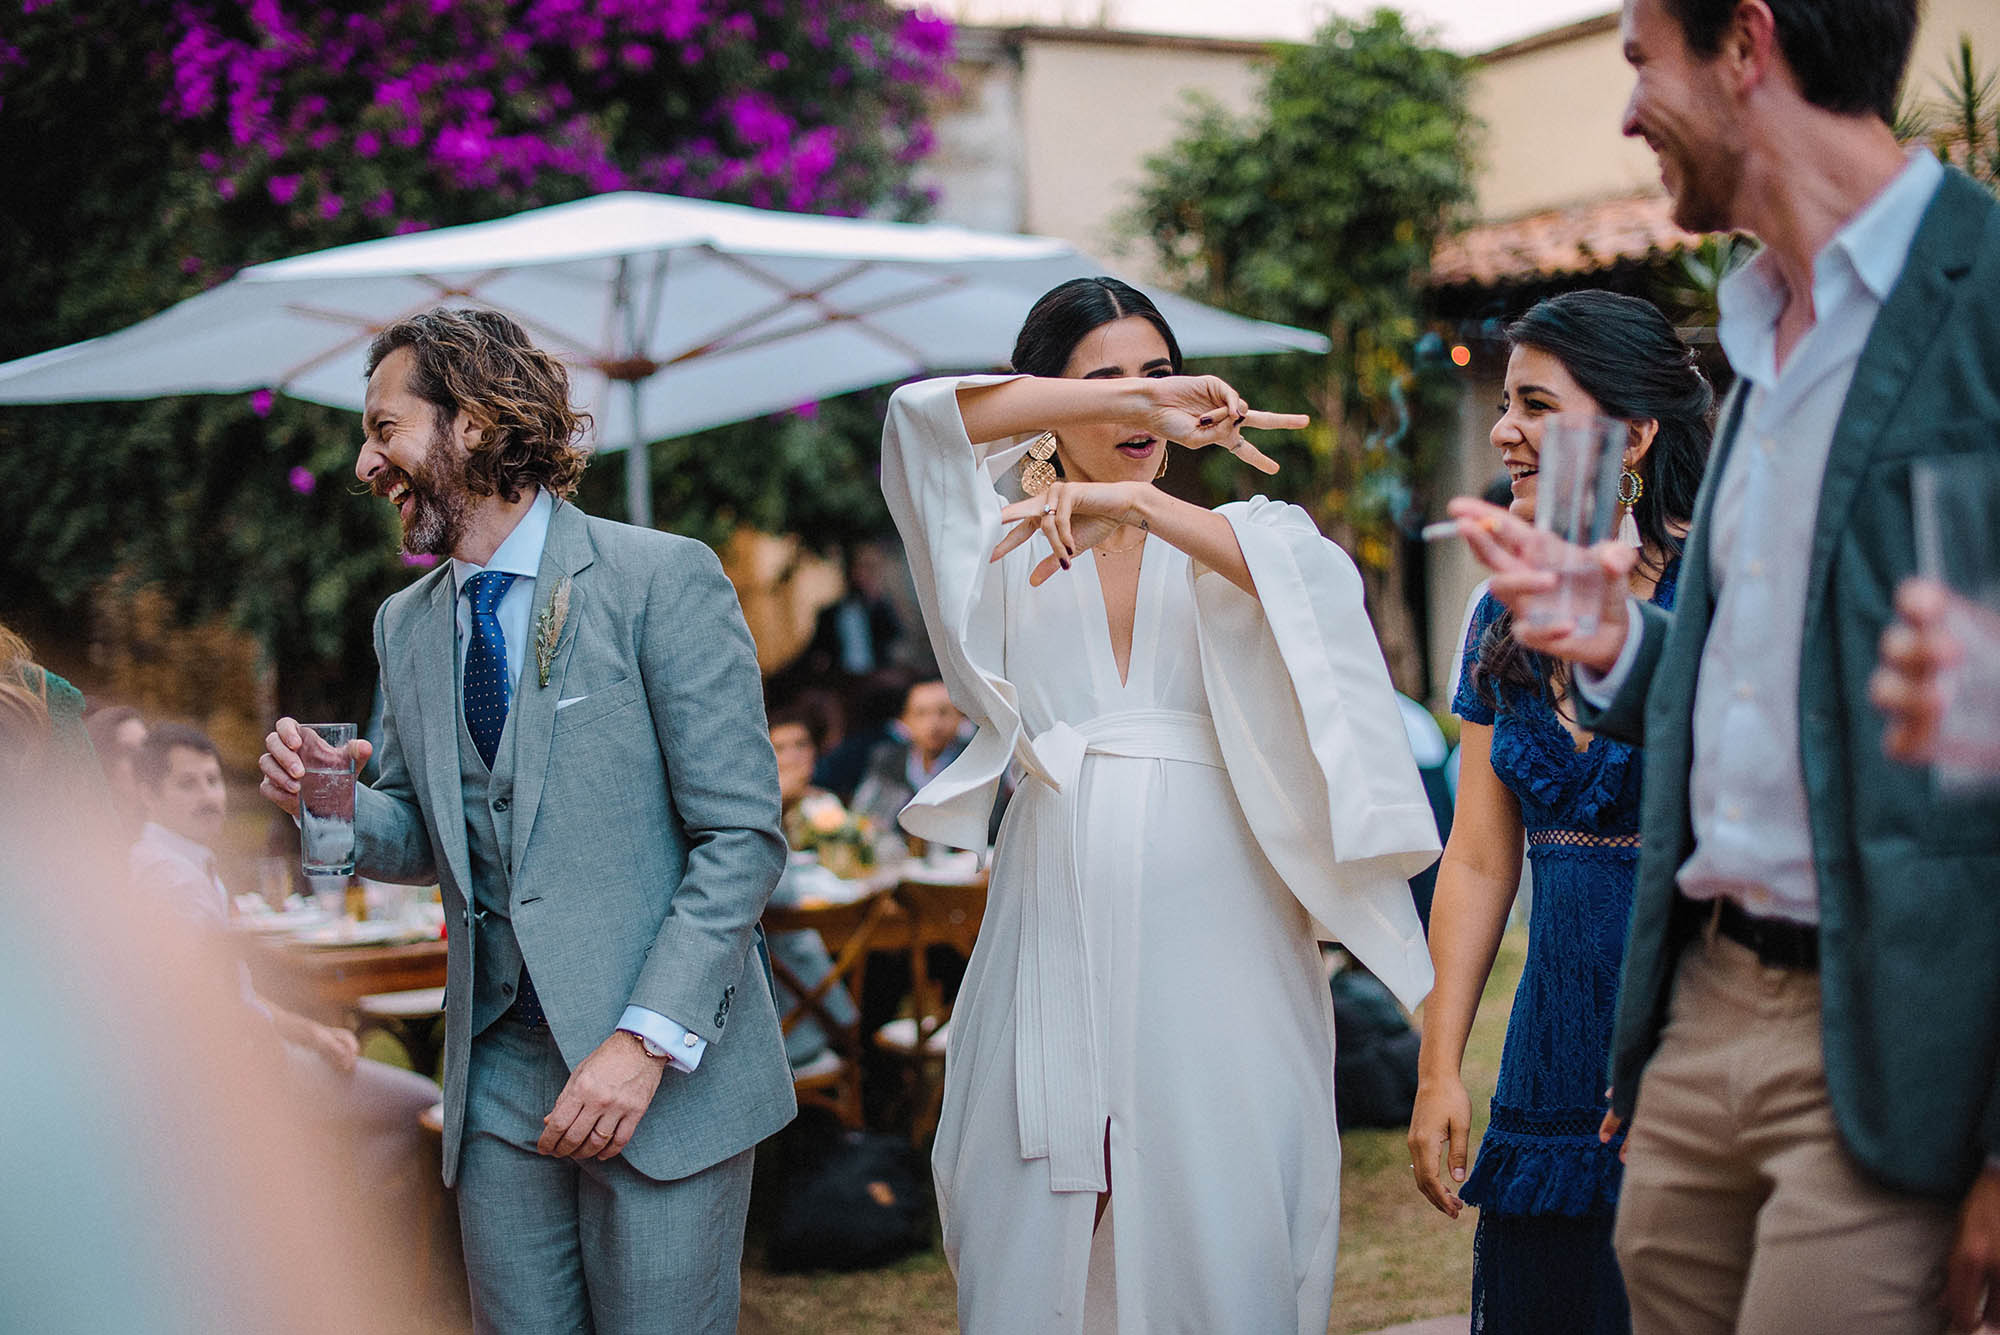 fiesta celebracion pedida mano magali espinosa fotografa destino weddings boda hacienda documental 2019 tendencias wedding planner.jpg